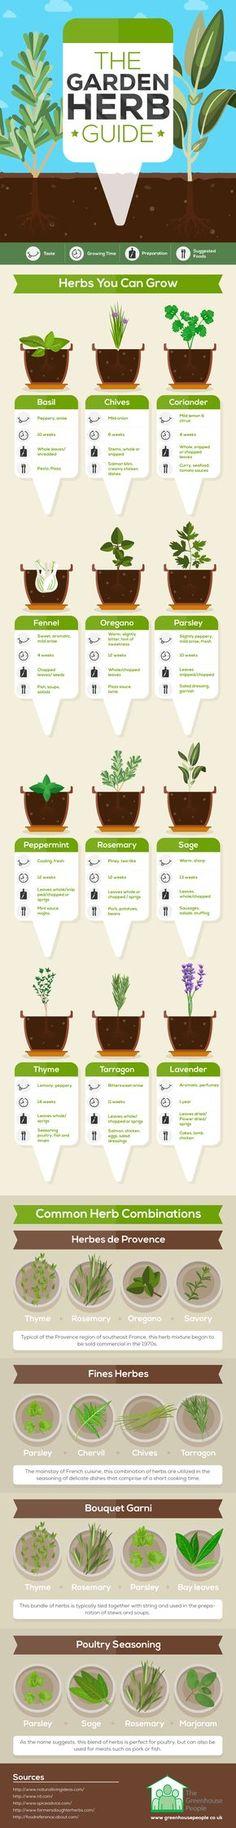 The Garden Herb Guide #Infographic #Gardening